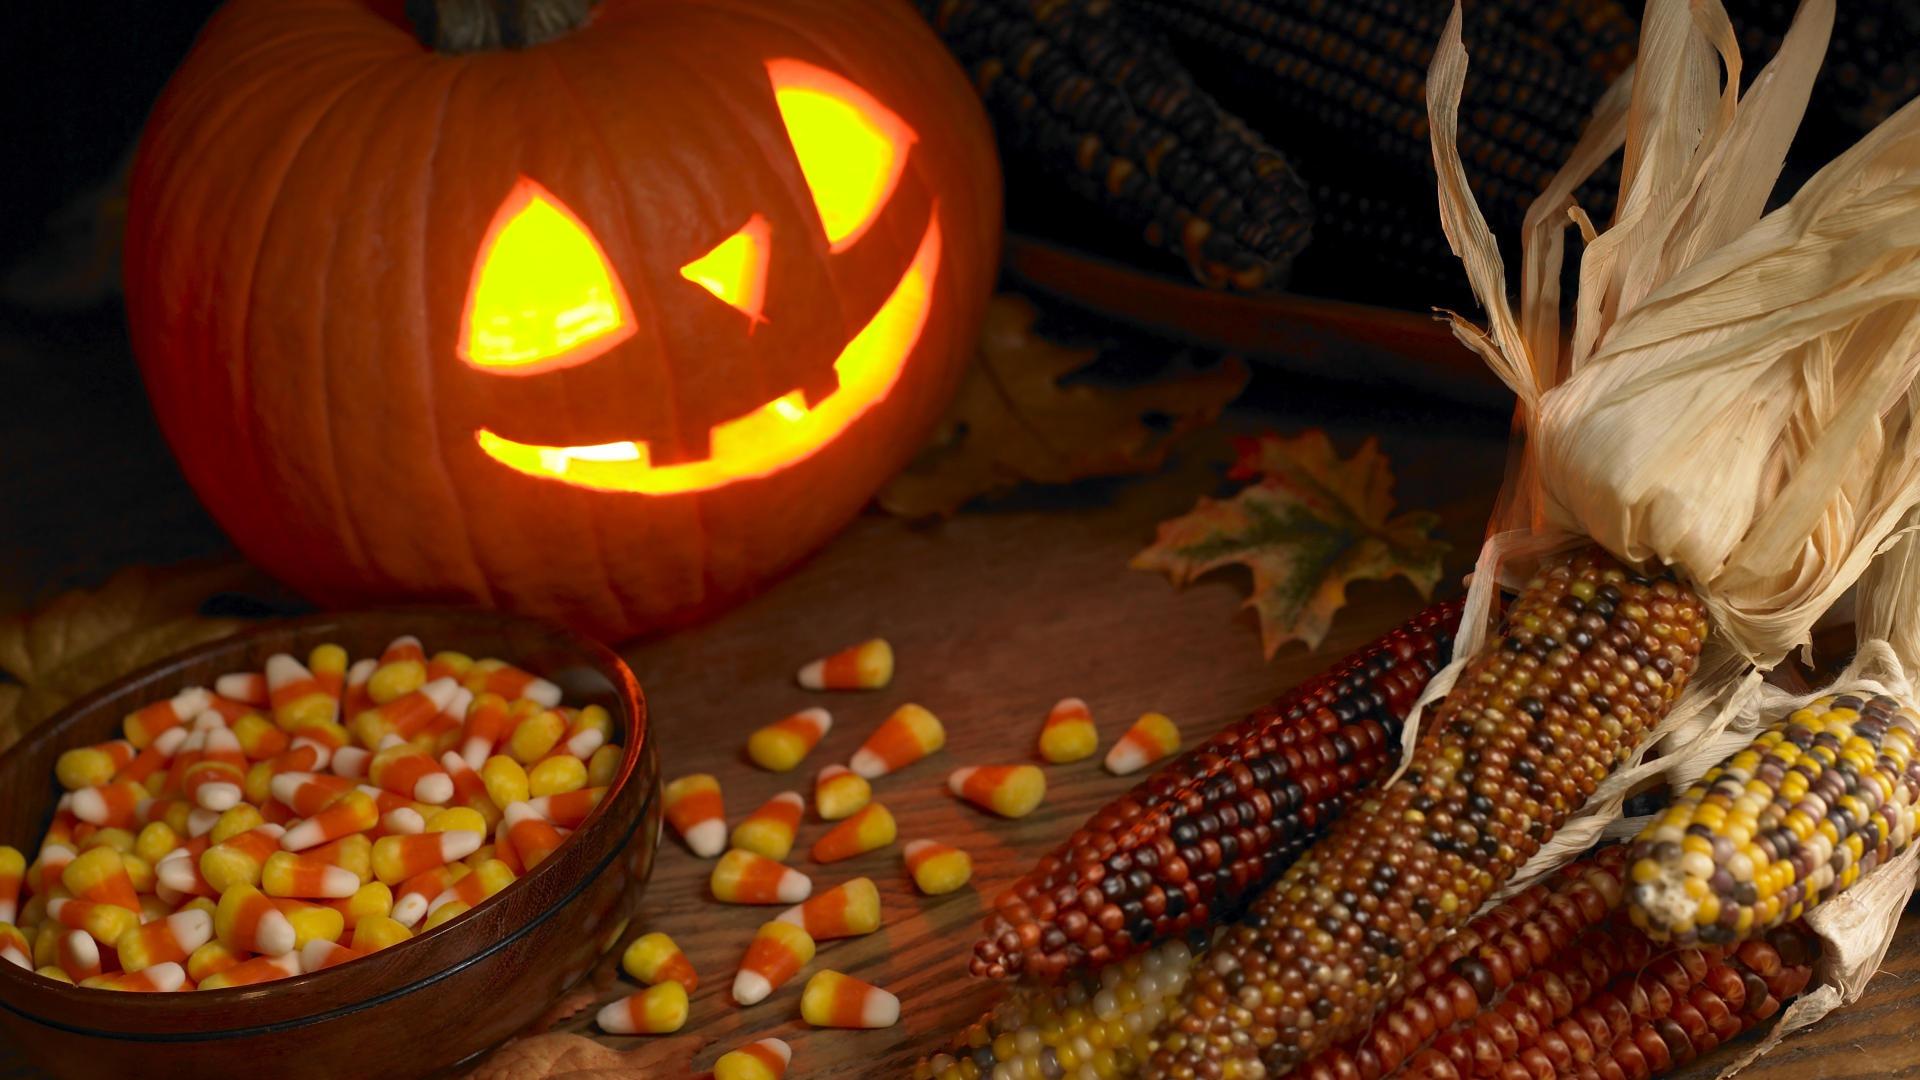 Fall Pumpkin Wallpaper And Screensavers Images 1920x1080